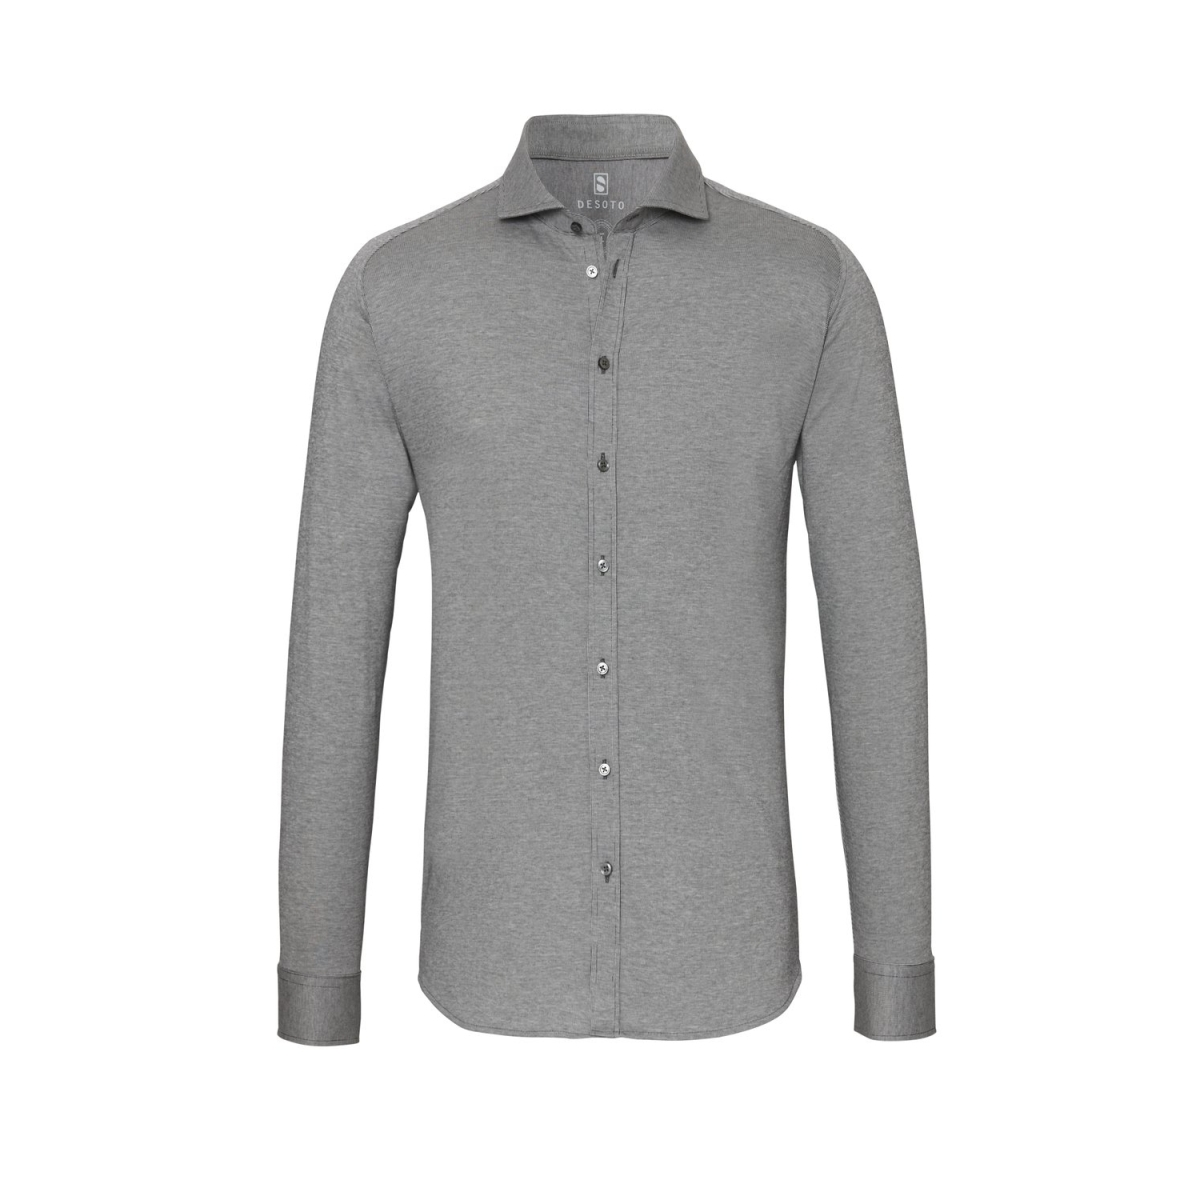 new hai 97507 3 desoto overhemd 702 grey cotele